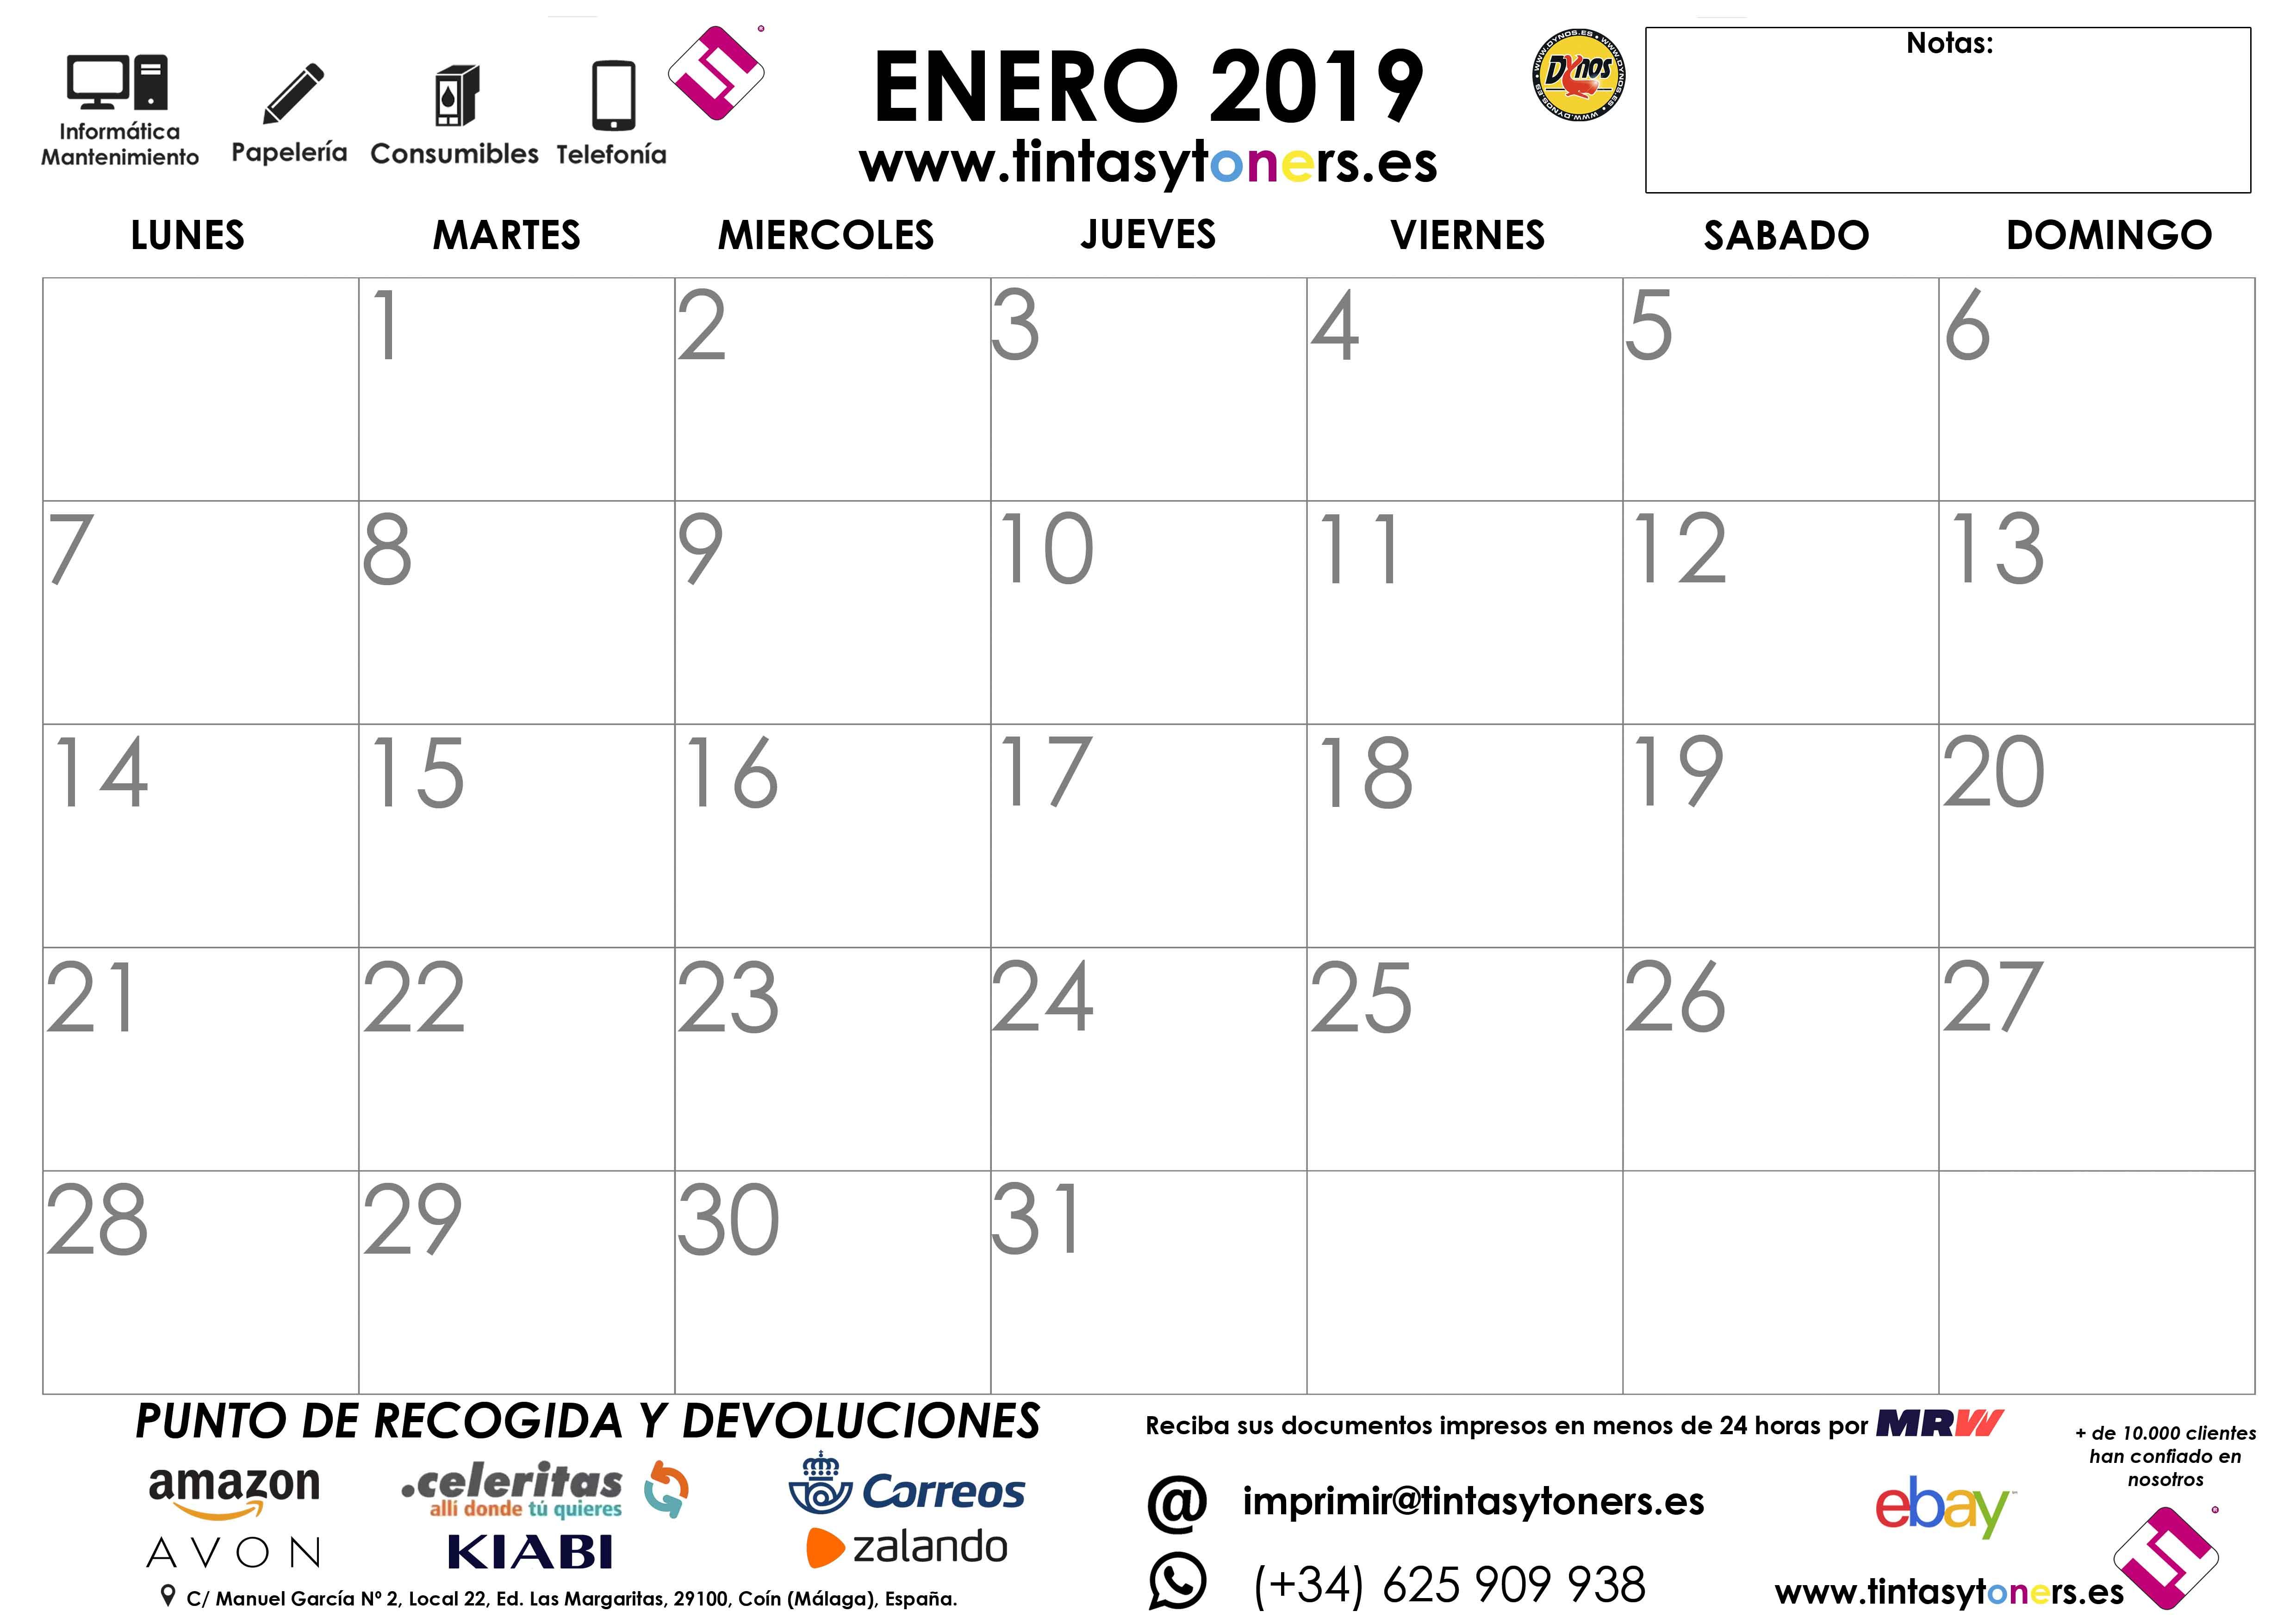 1 ENERO 2019 CALENDARIO TINTASYTONERS 2019